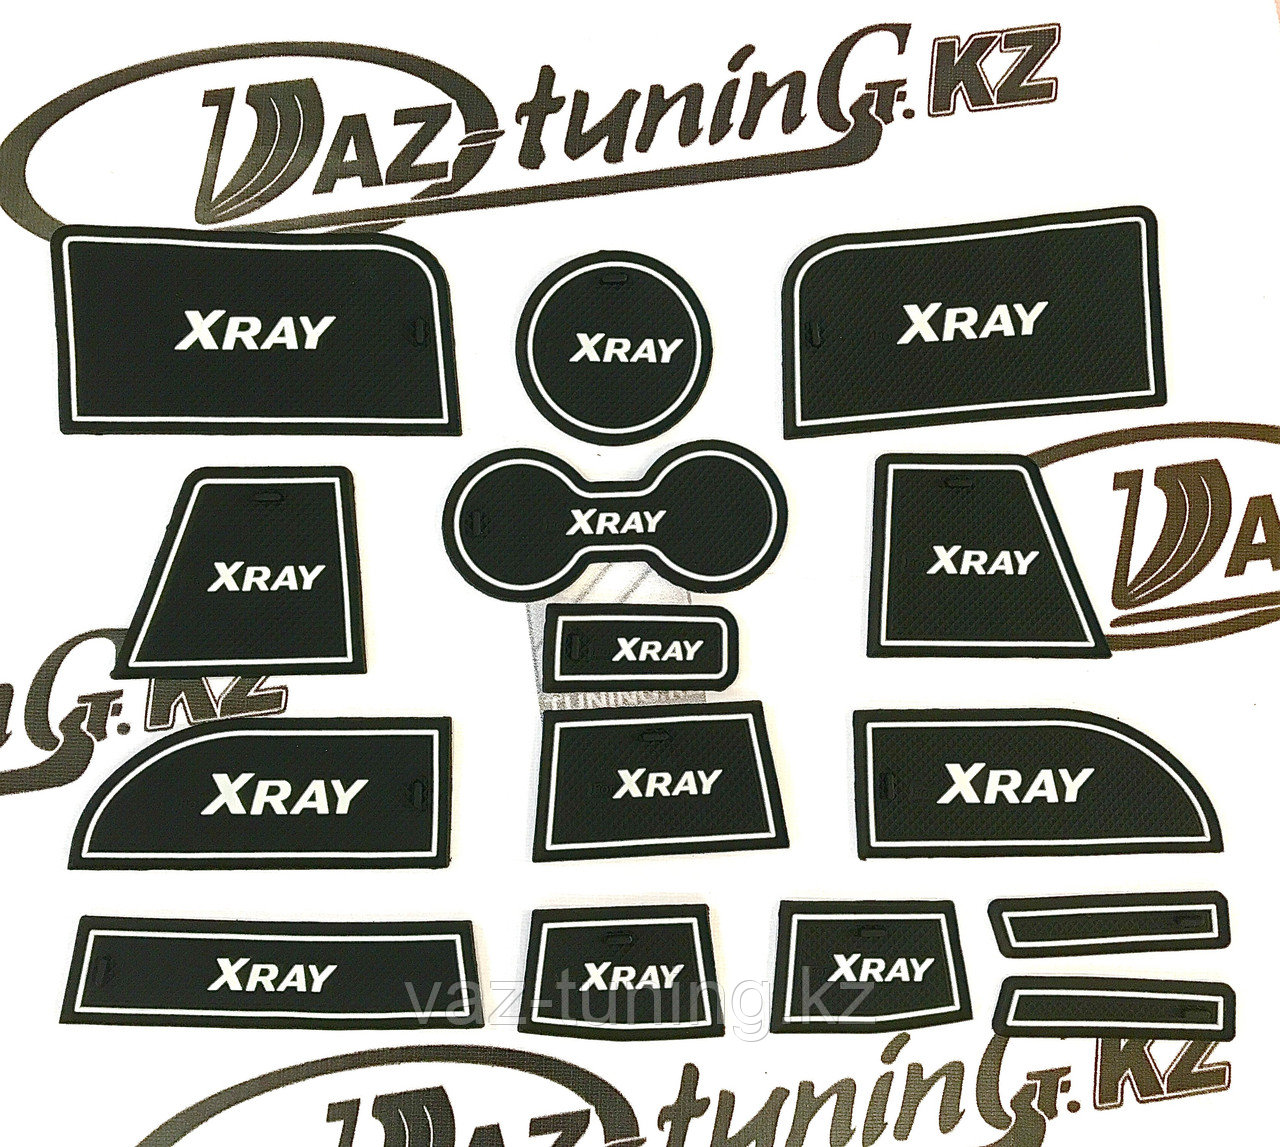 Коврики в панель приборов Лада X-Ray